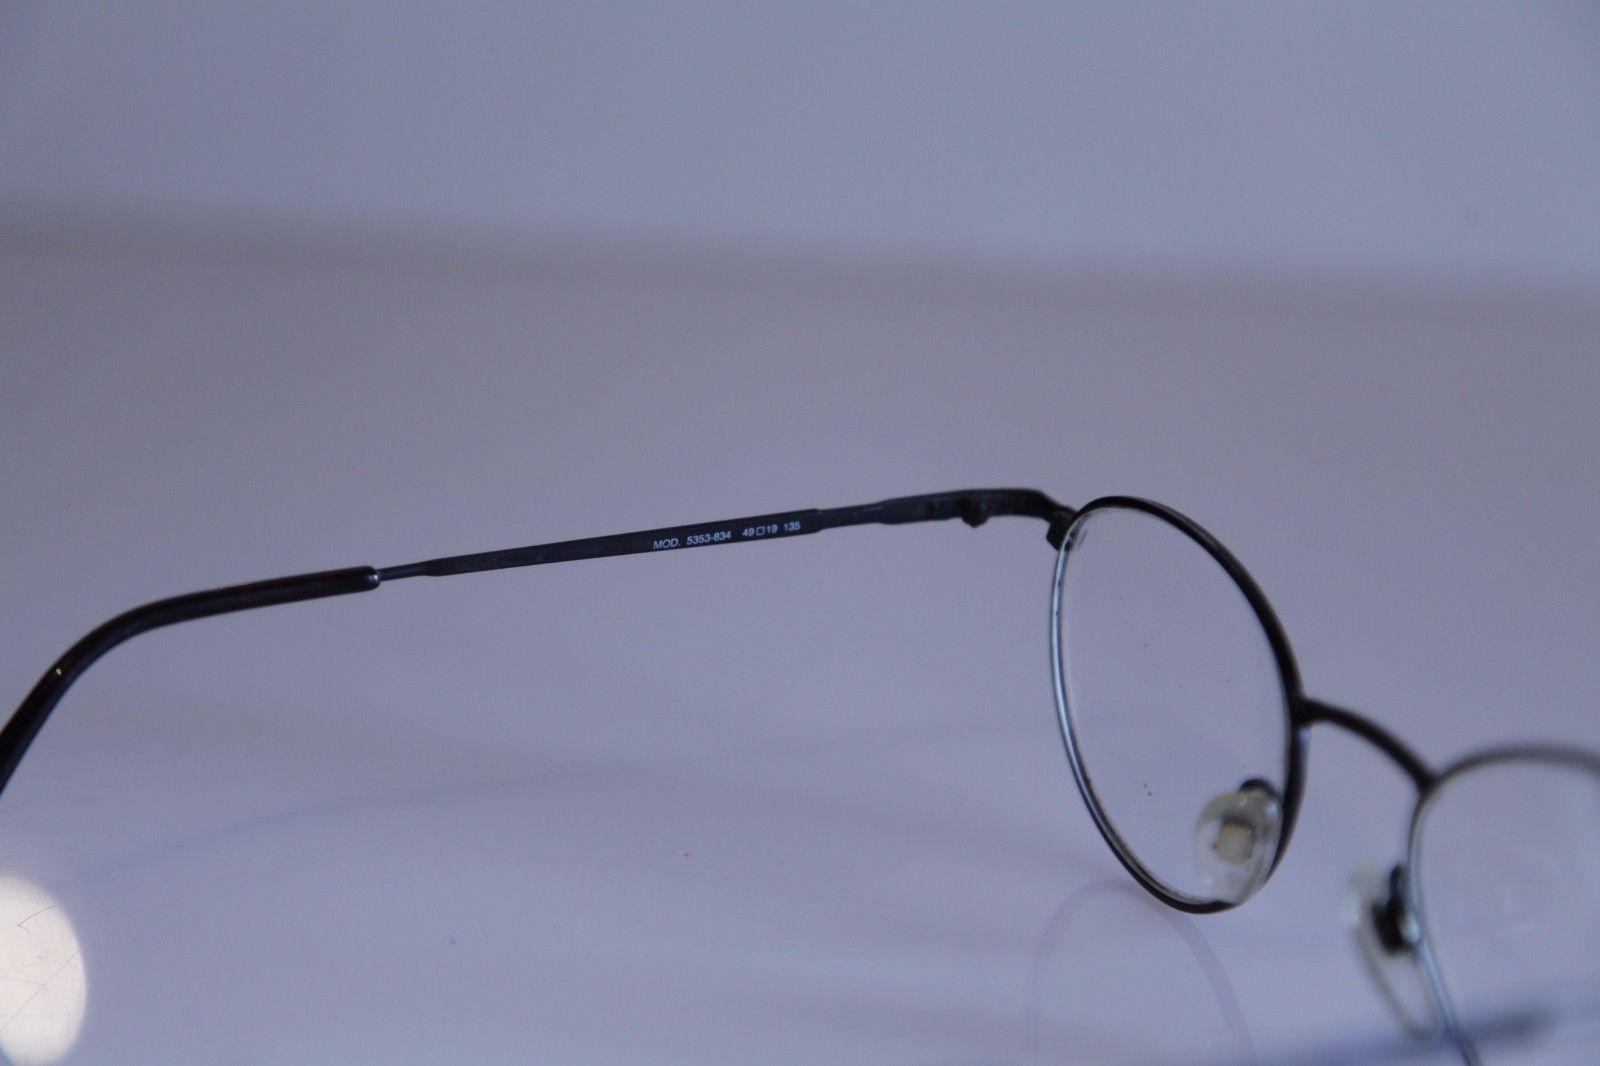 METZLER Eyewear, Dark Blue Frame, RX-Able  Prescription lenses. GERMANY